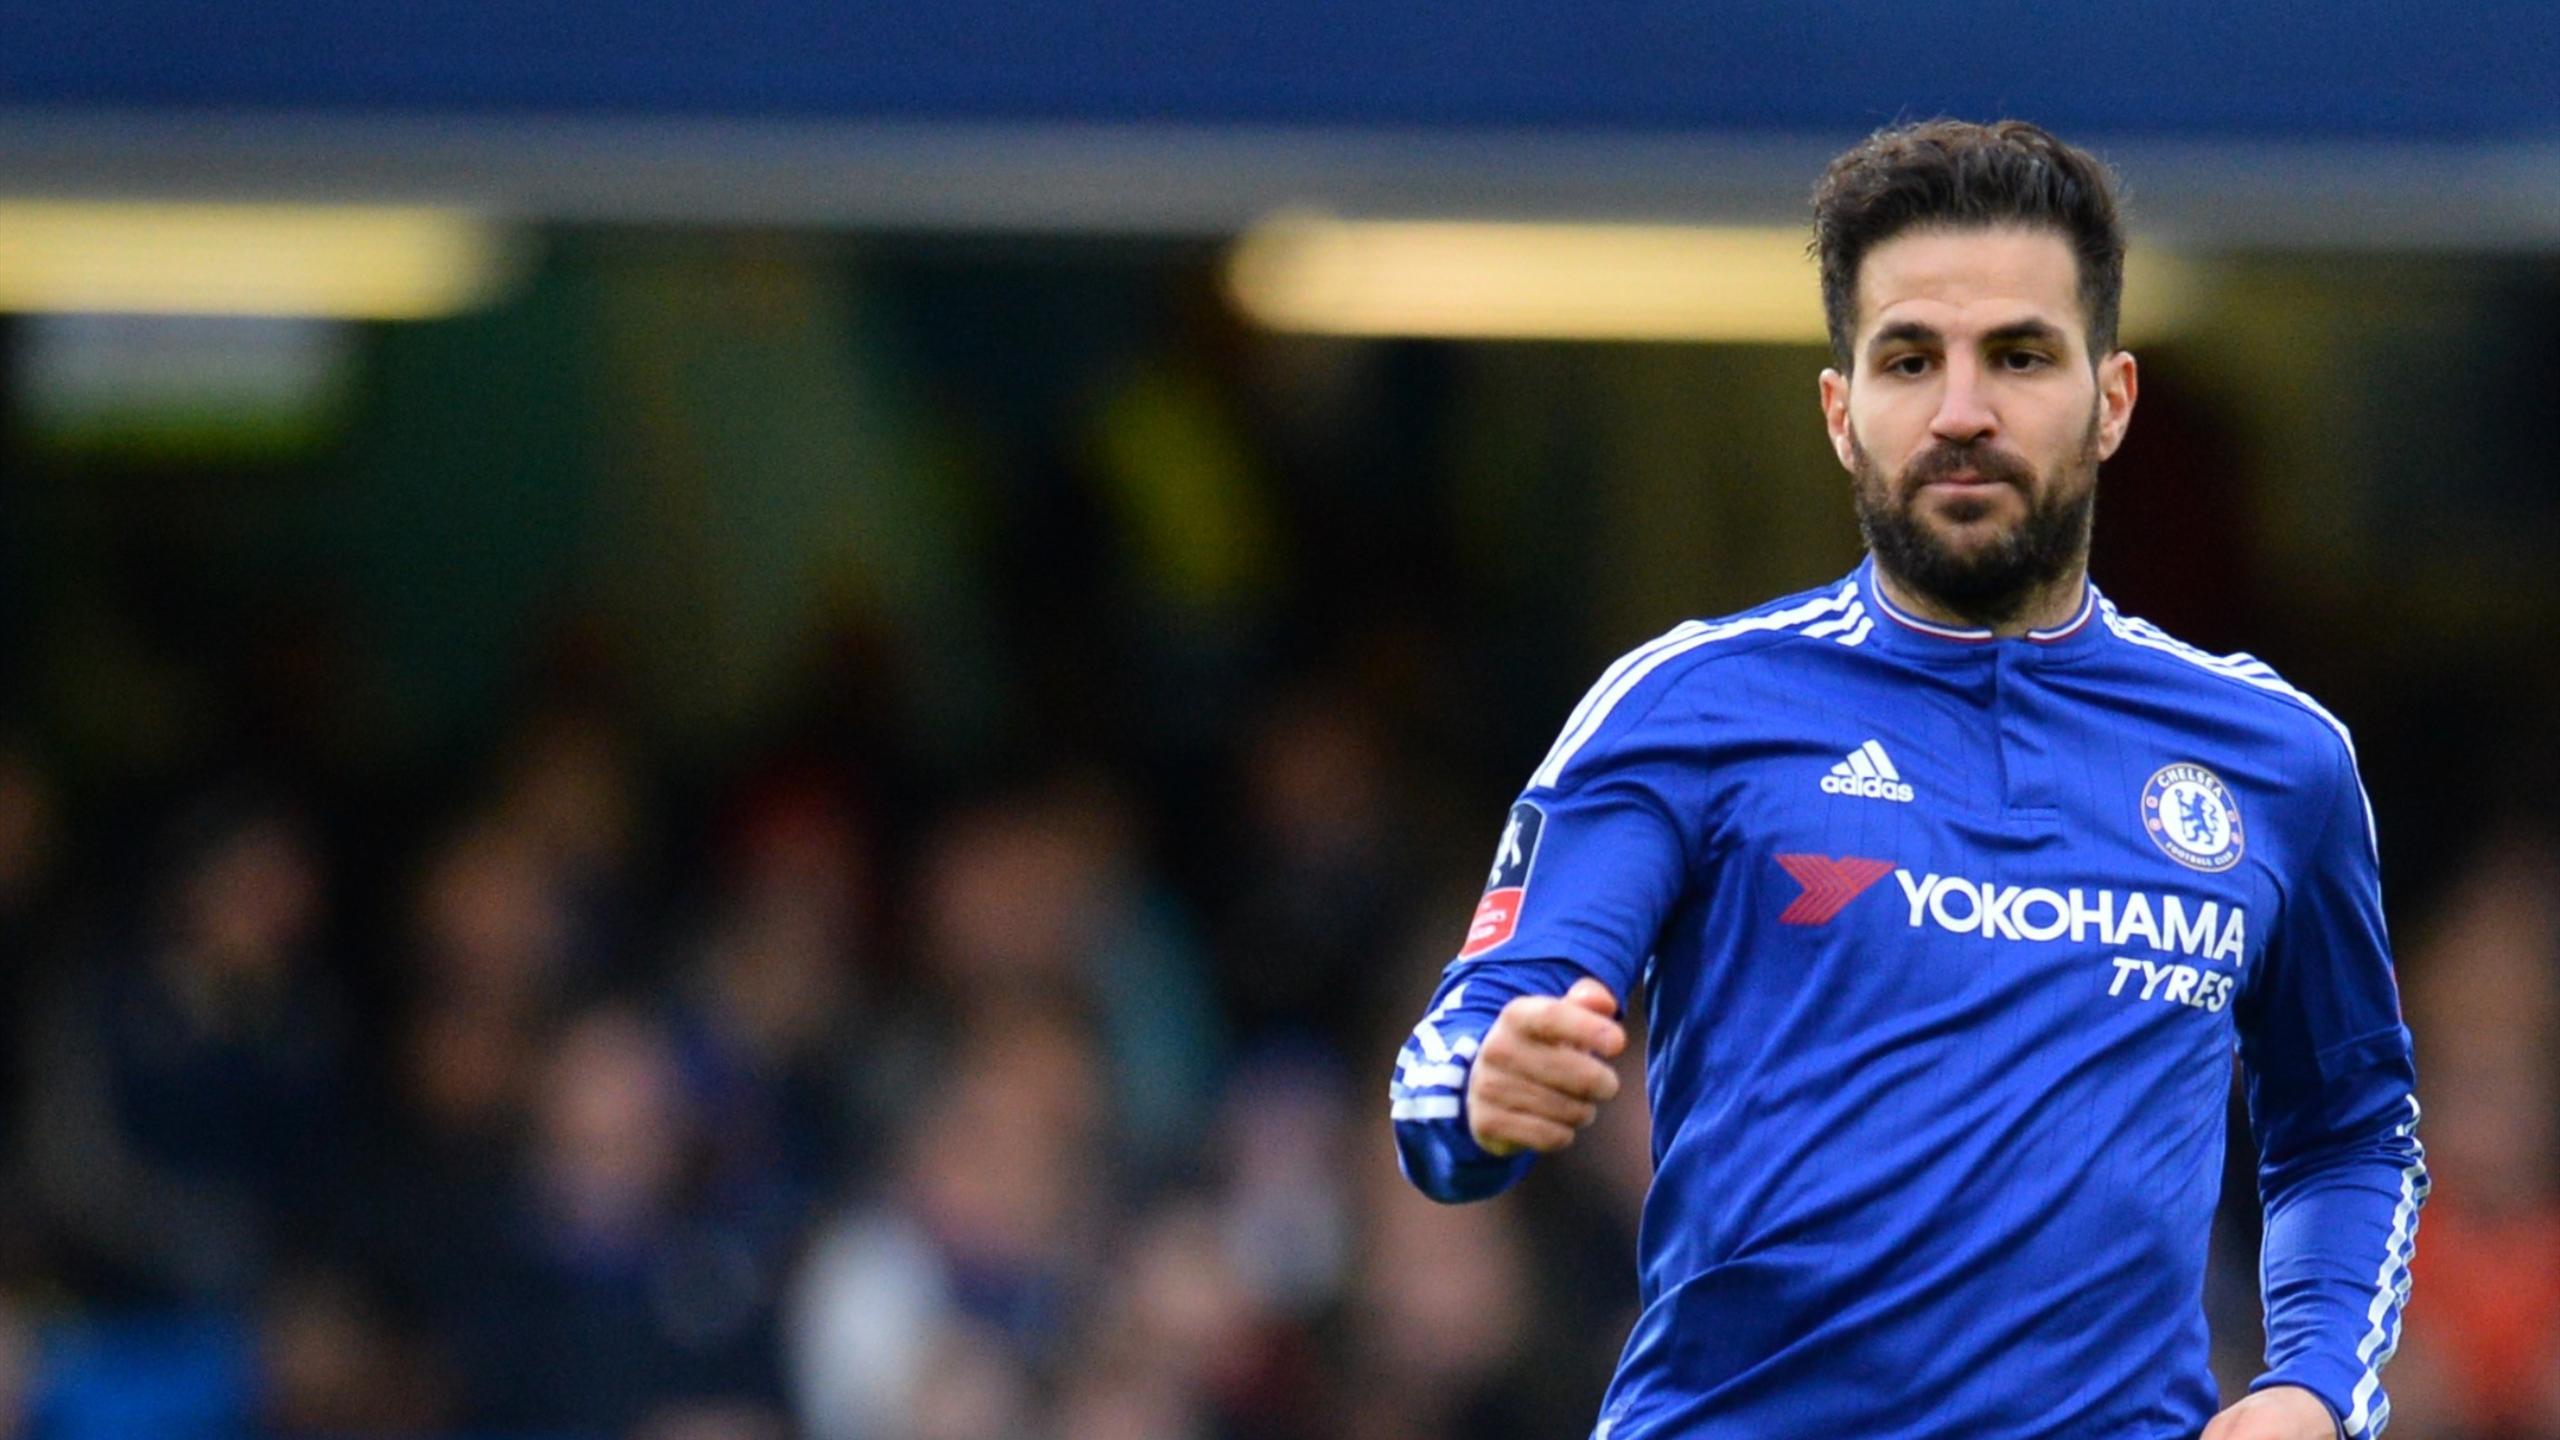 Chelsea's Spanish midfielder Cesc Fabregas